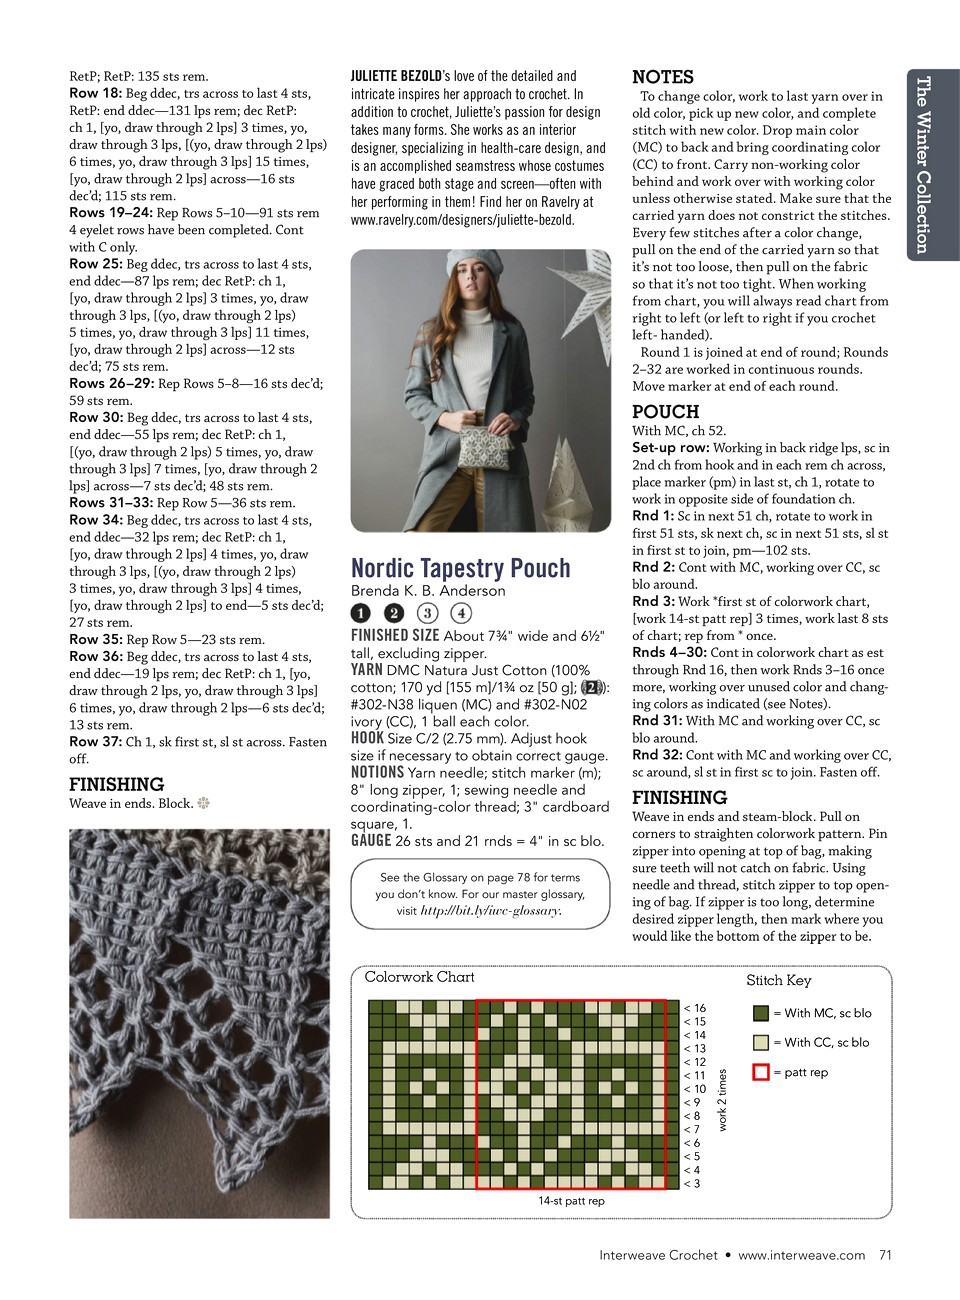 Interweave Crochet Winter 2019-72